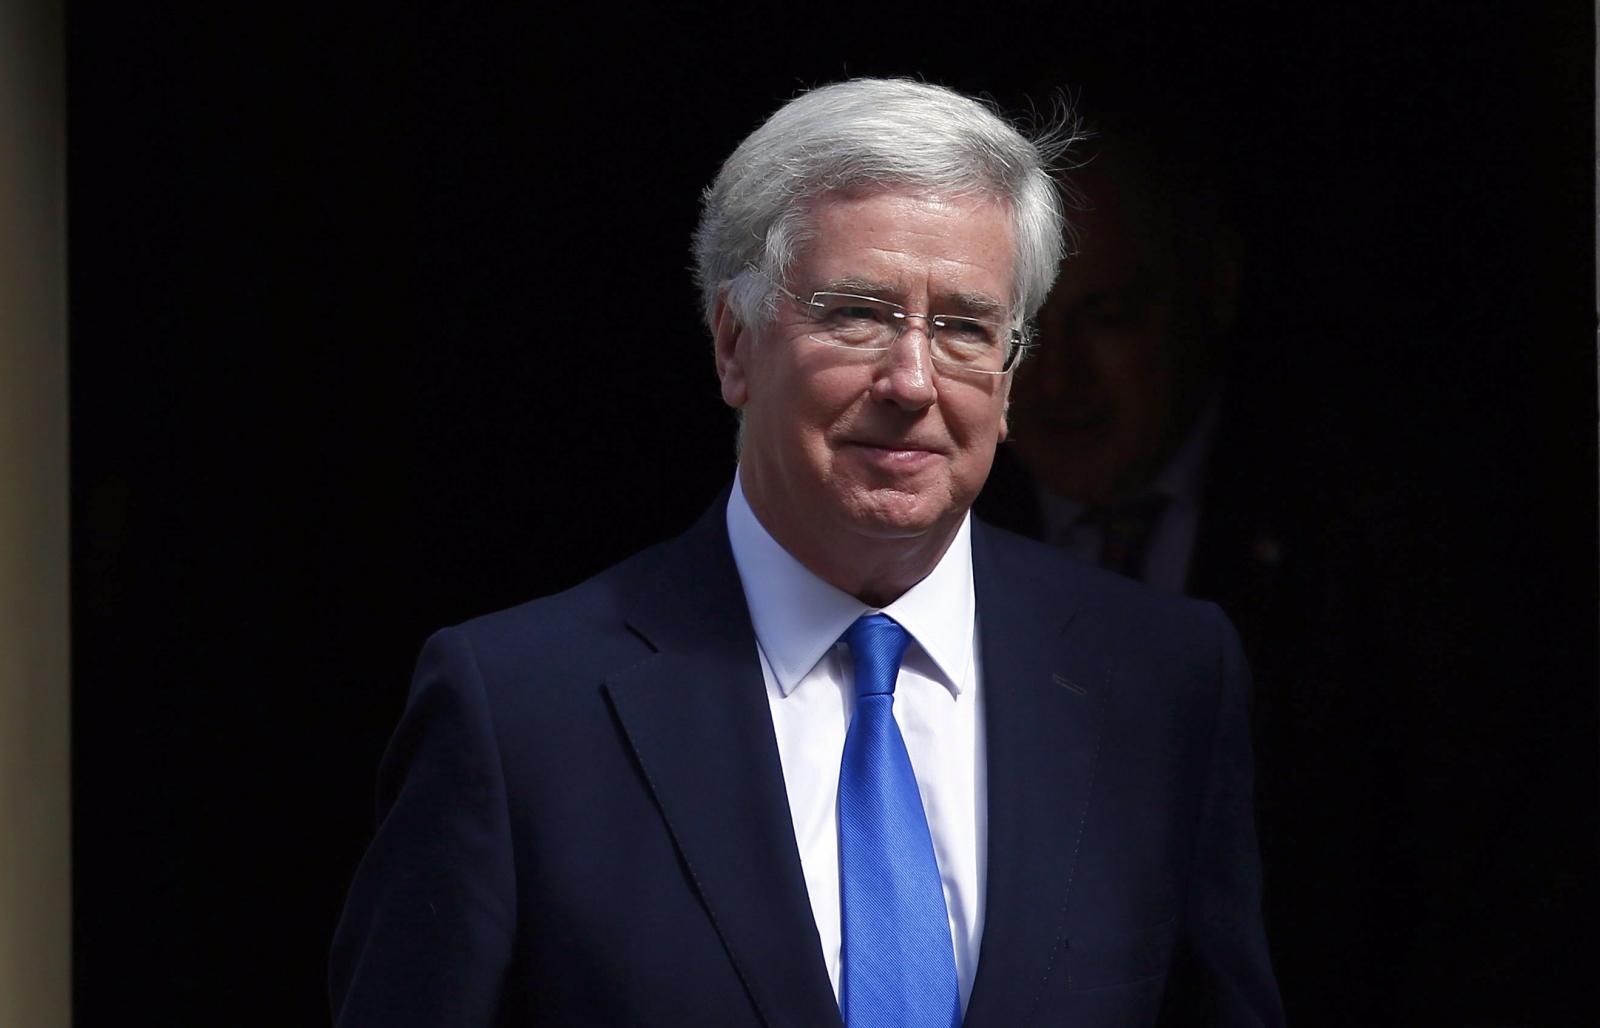 UK Defence minister Michael Fallon